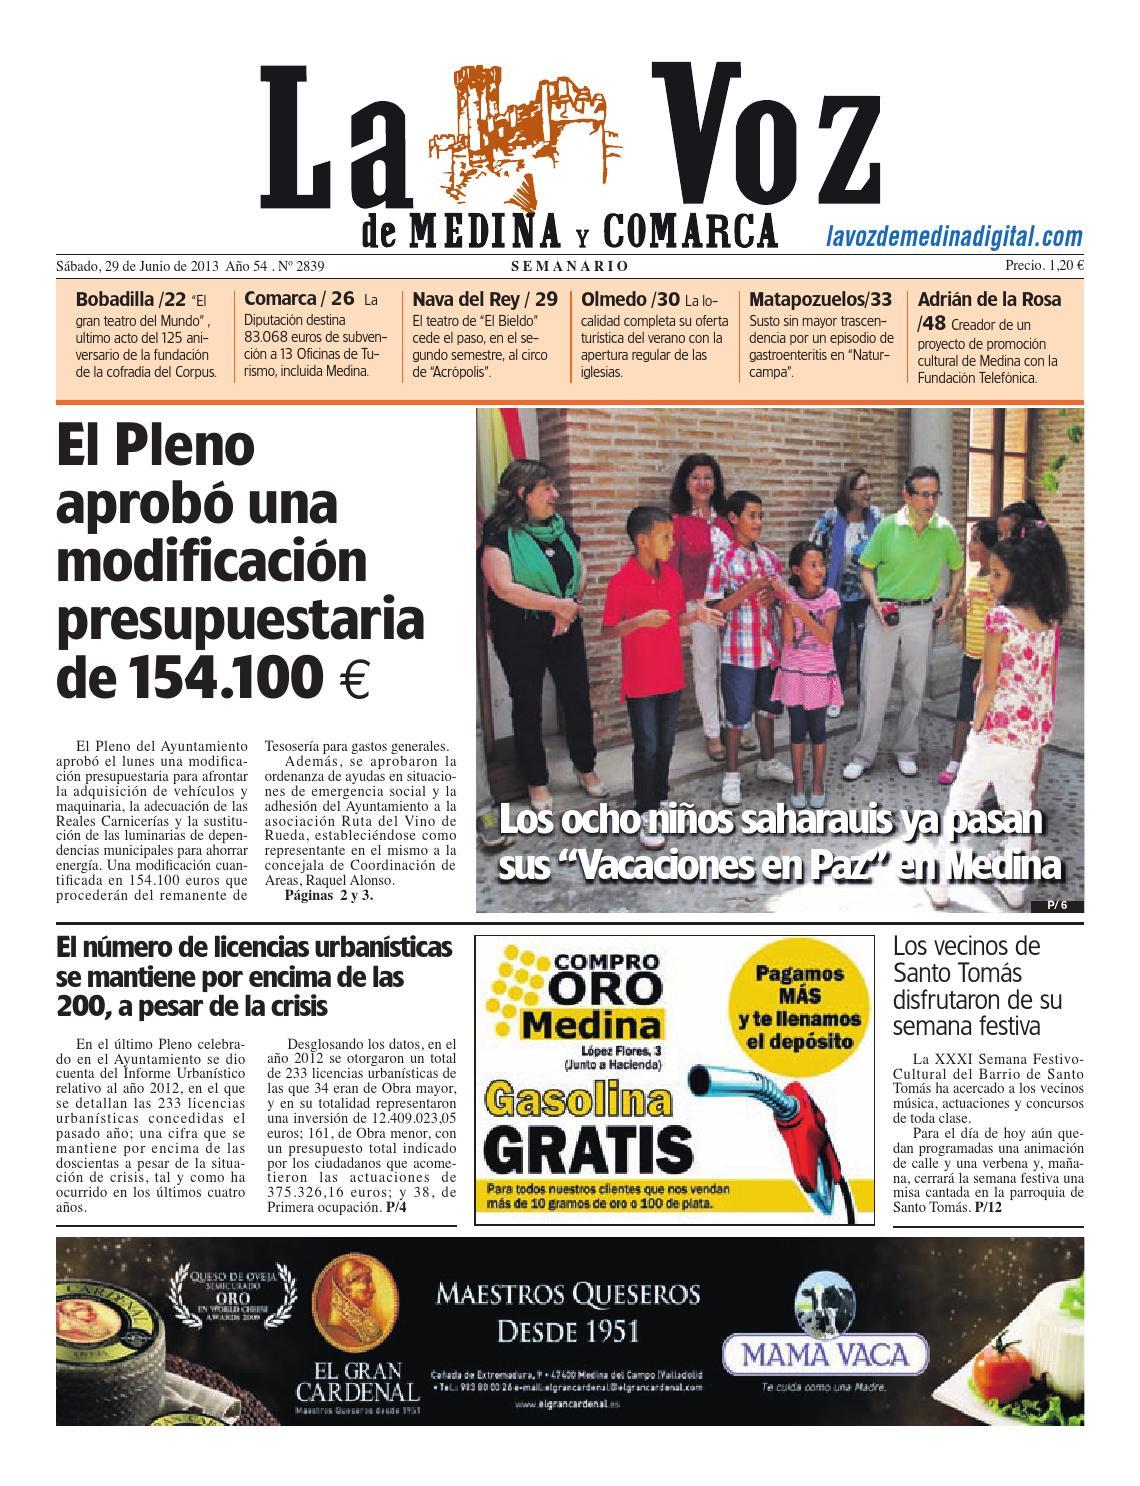 La Voz de Medina 130629 by La Voz de Medina - issuu